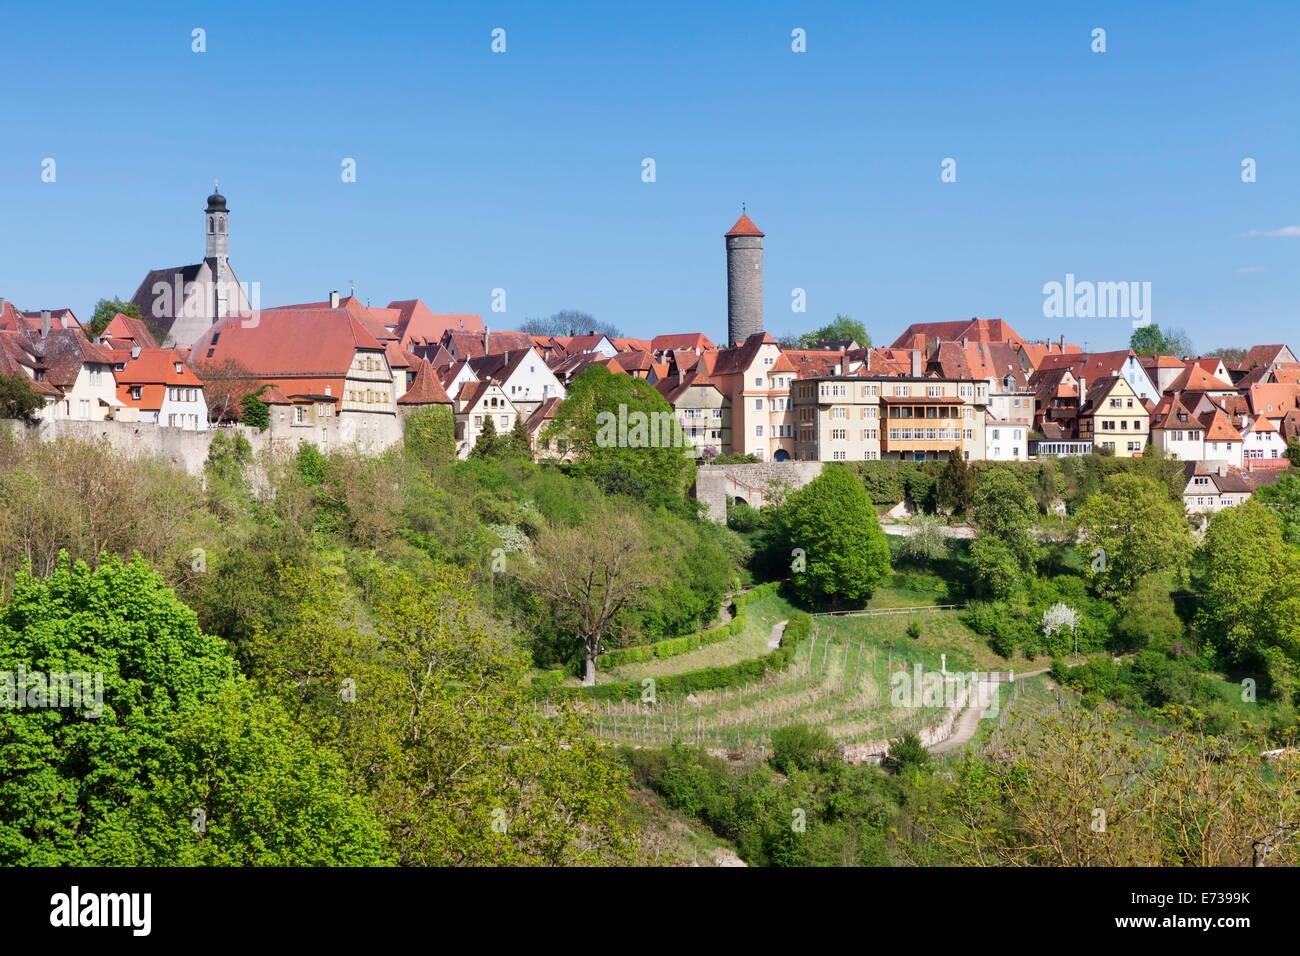 Rothenburg ob der Tauber, Romantic Road (Romantische Strasse), Franconia, Bavaria, Germany, Europe - Stock Image